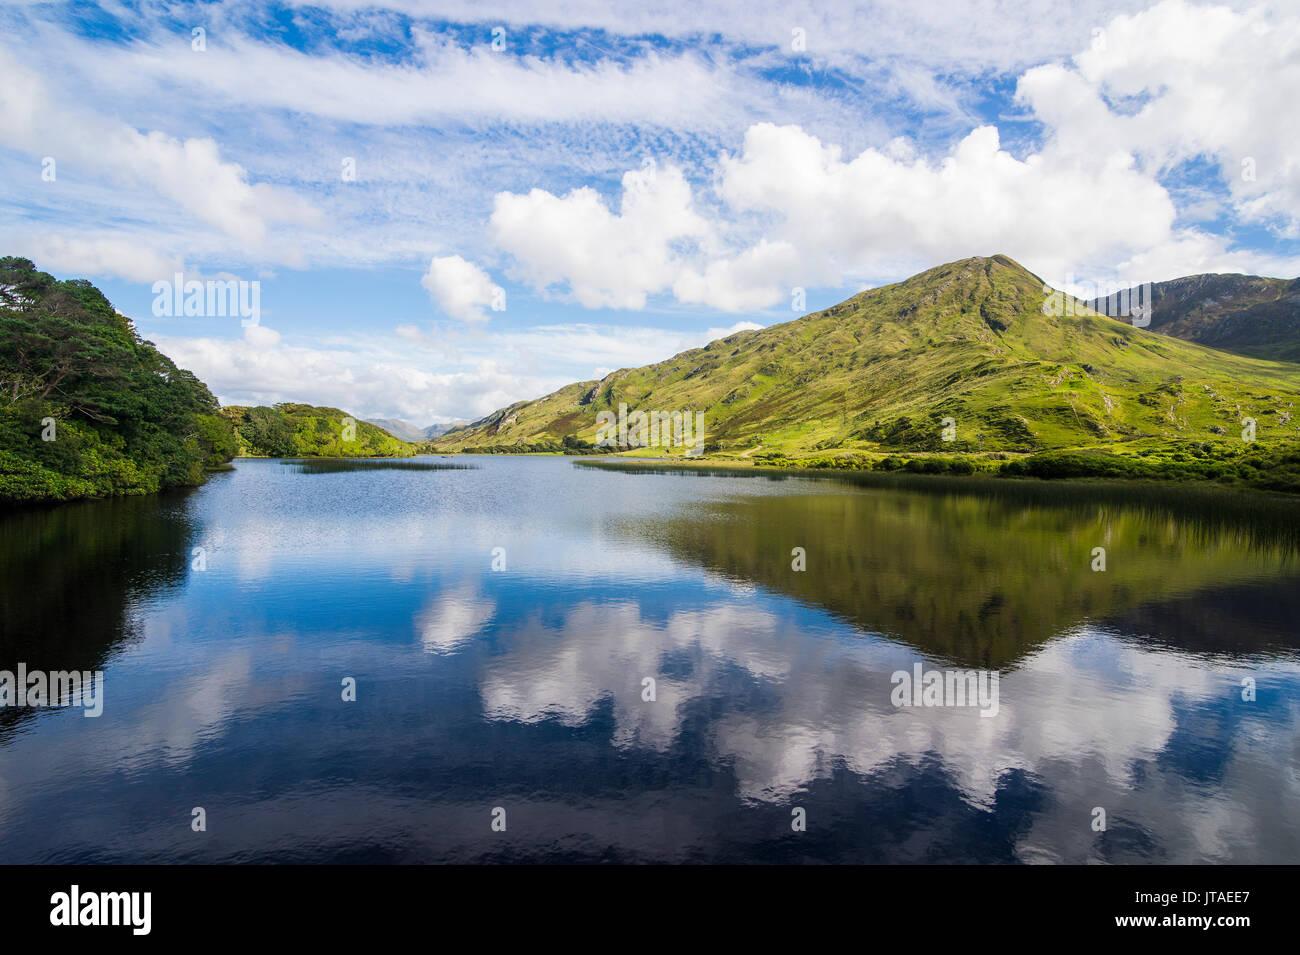 Kylemore abbey, Connemara National Park, County Galway, Connacht, Republic of Ireland, Europe - Stock Image